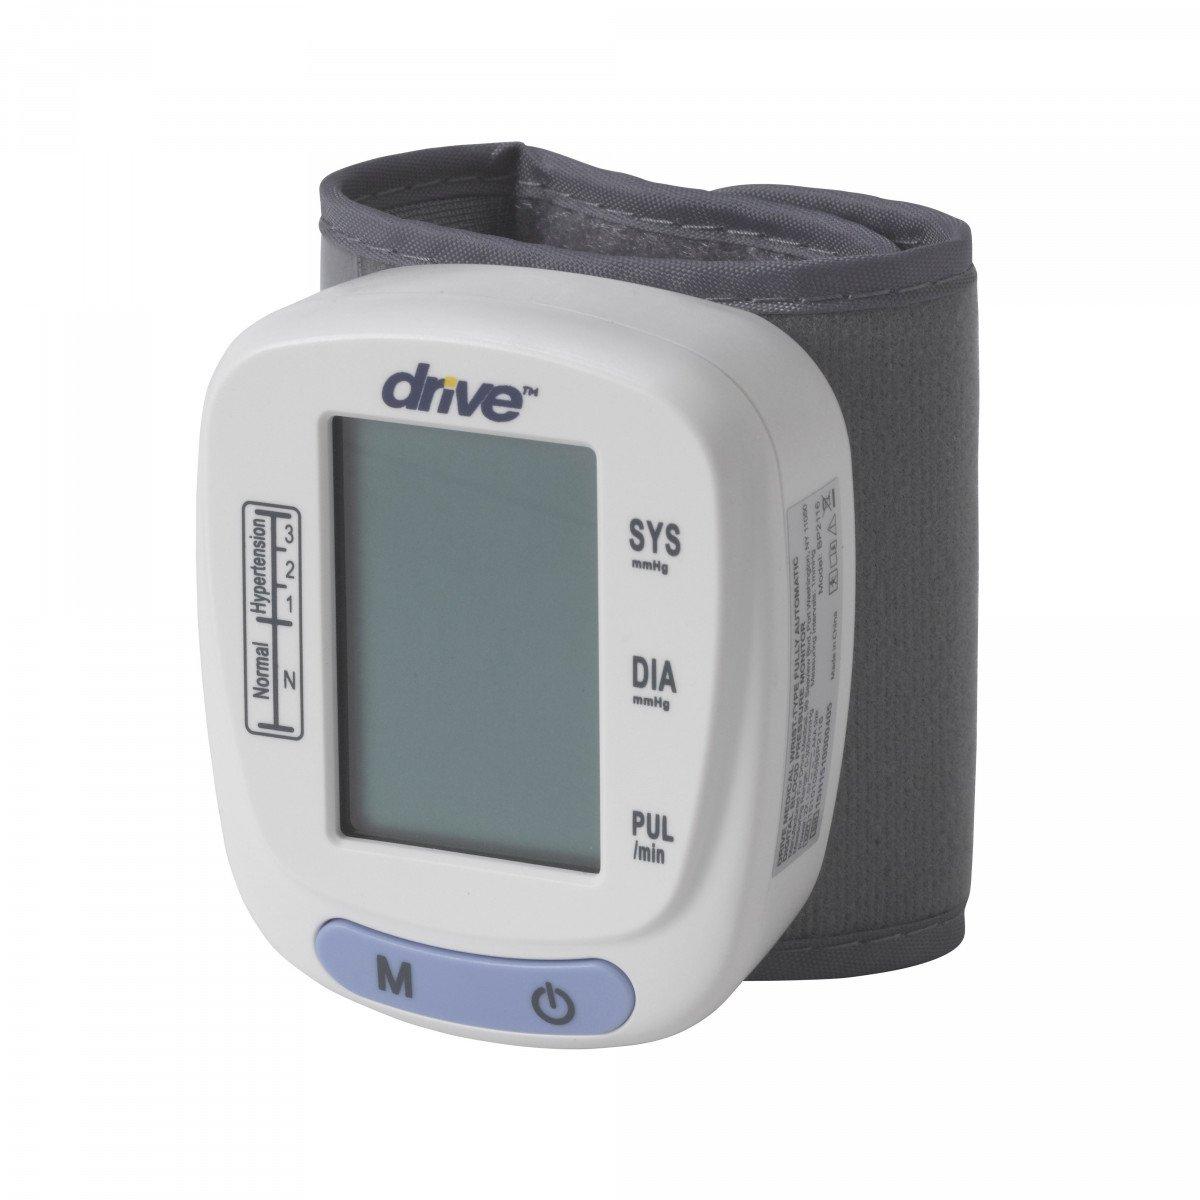 automatic blood pressure monitor wrist model 10f